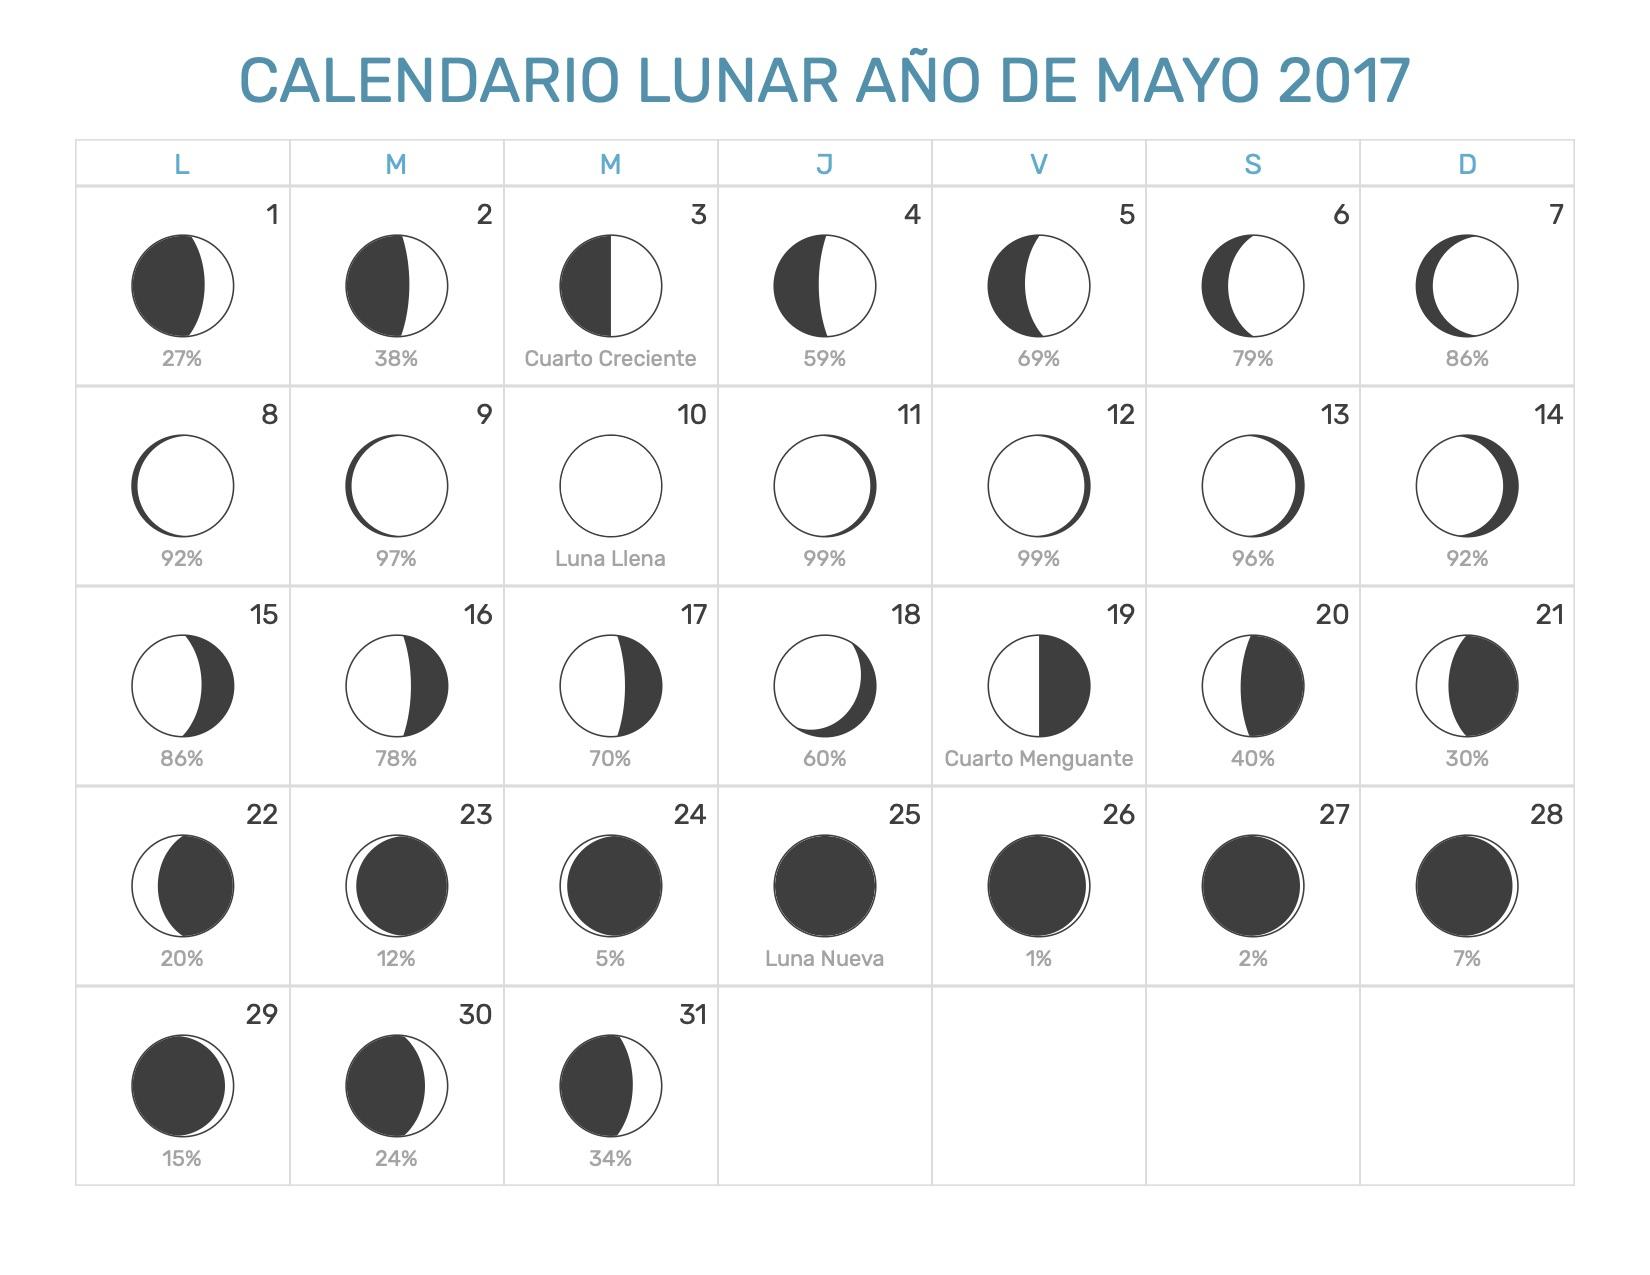 calendario lunar mayo 2017 On calendario lunar mayo